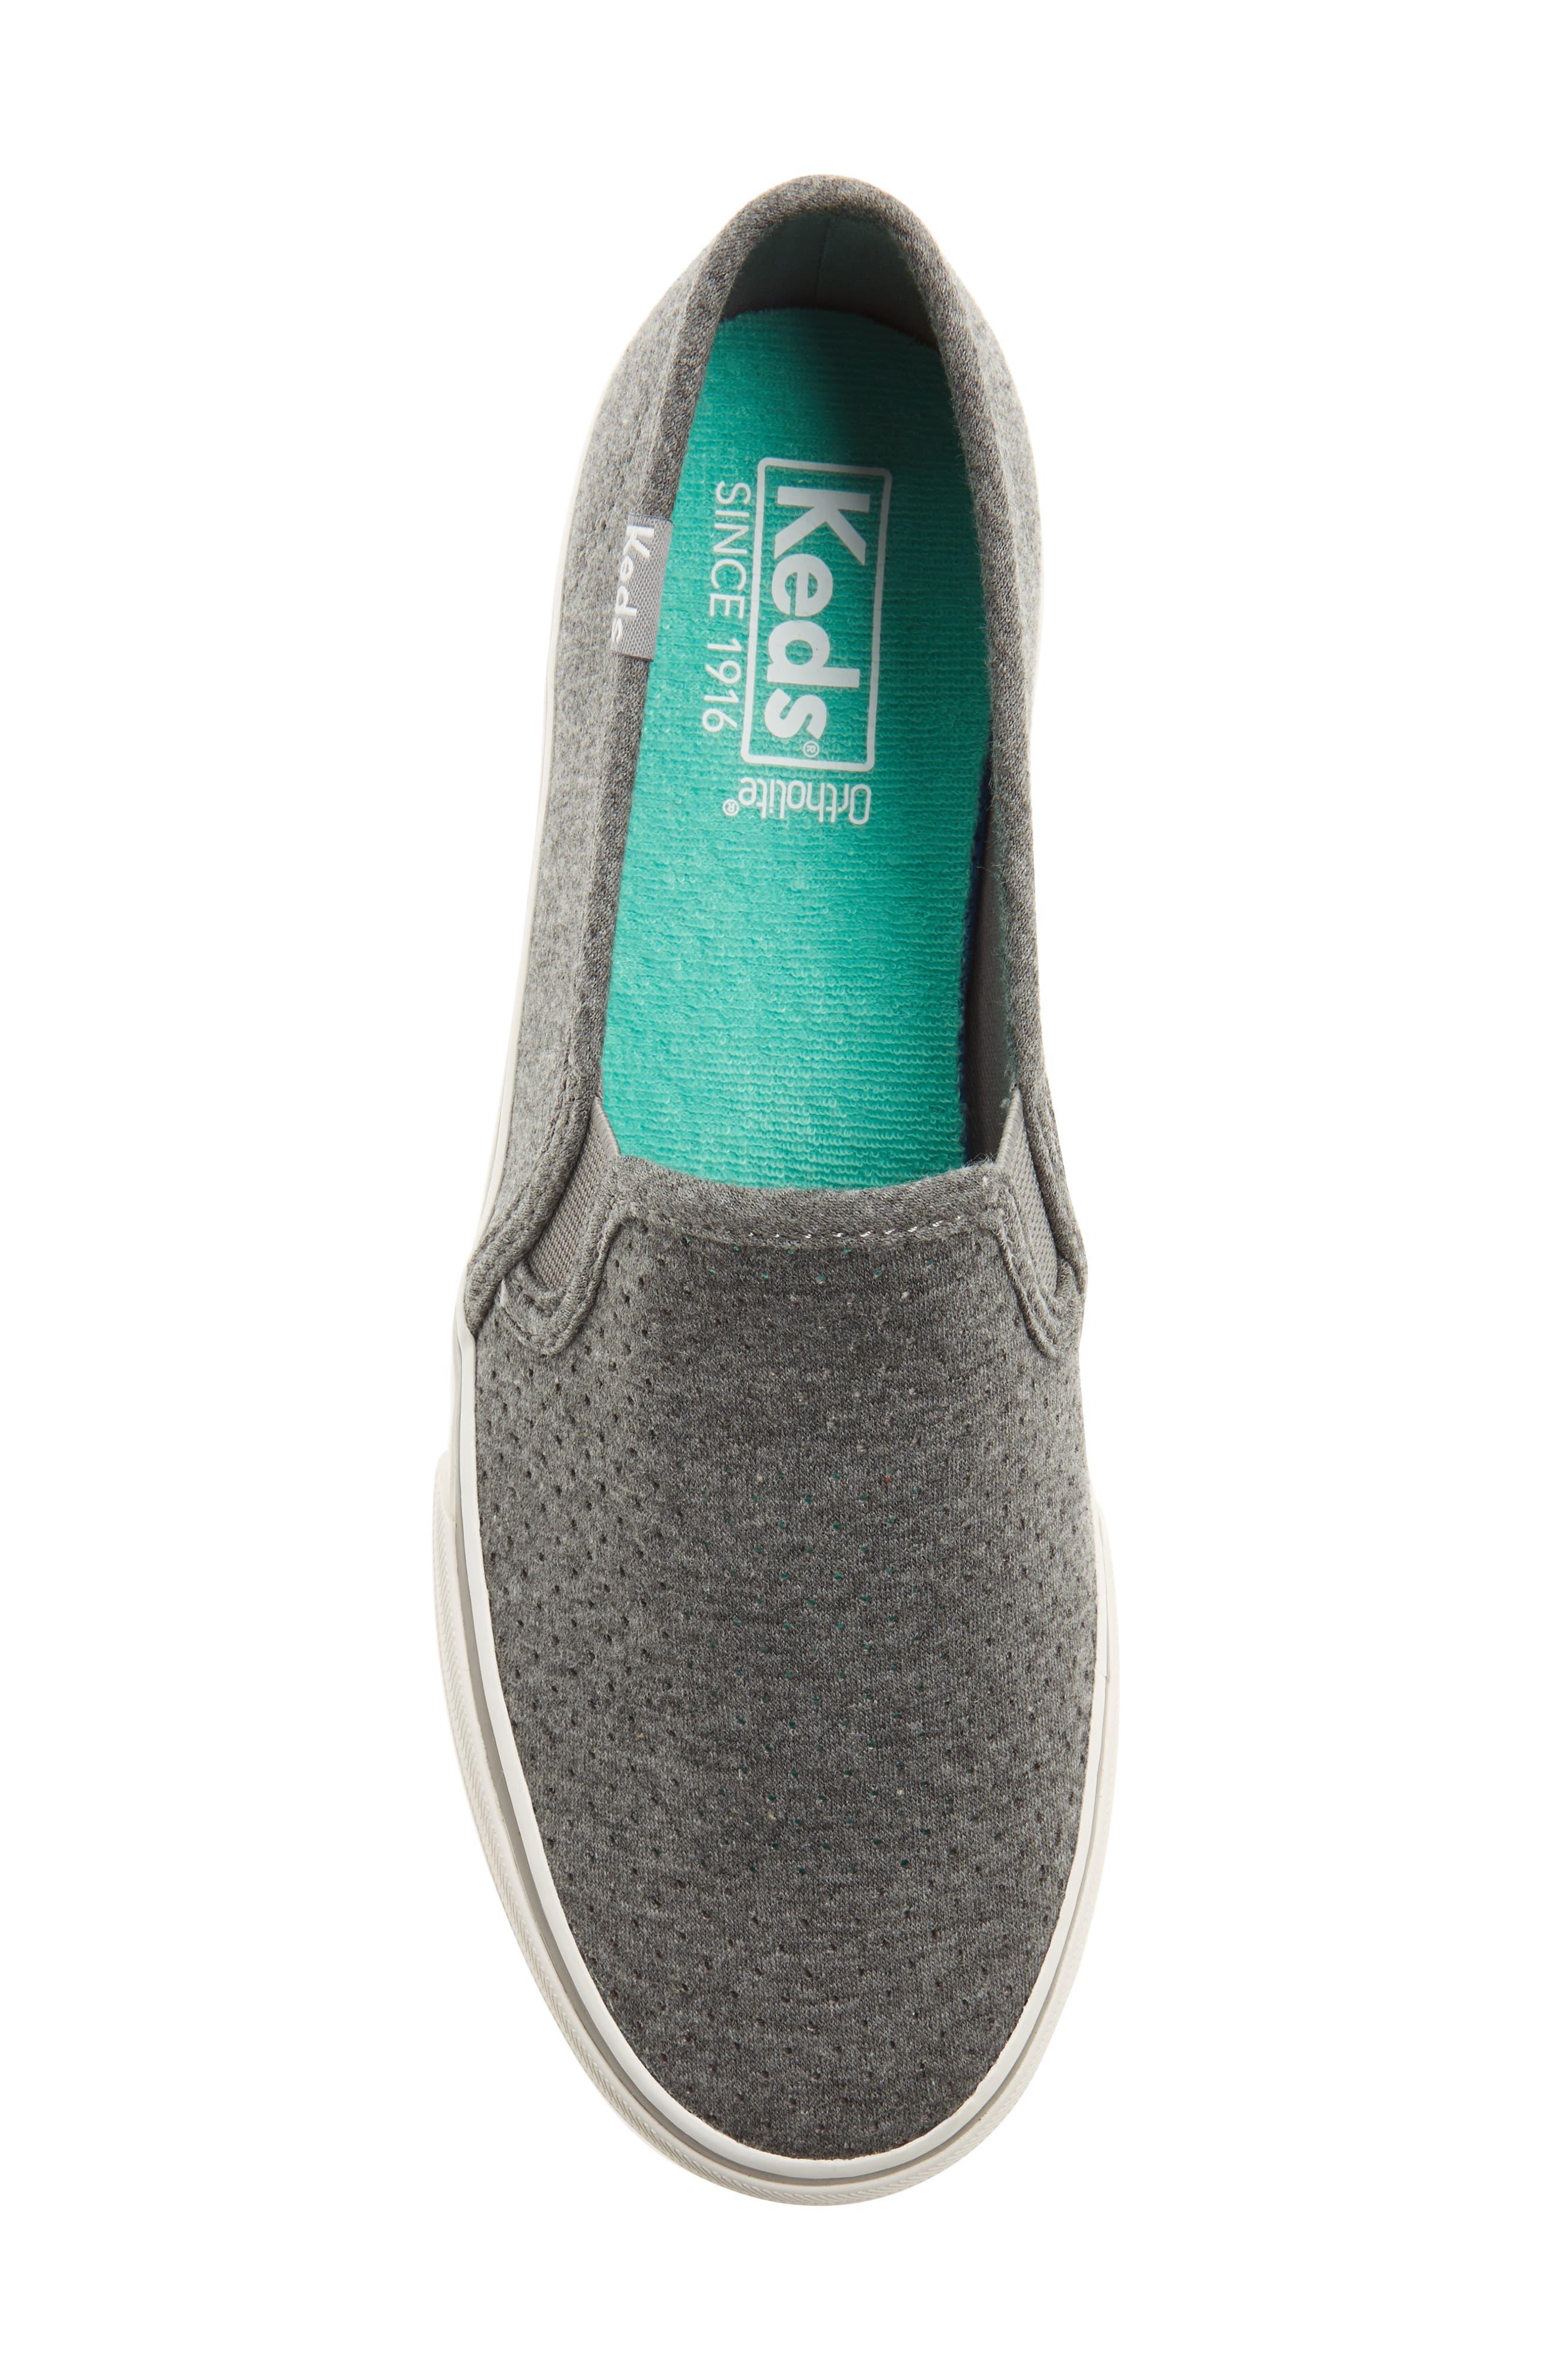 Double Decker Perforated Slip-On Sneaker,                             Alternate thumbnail 5, color,                             021